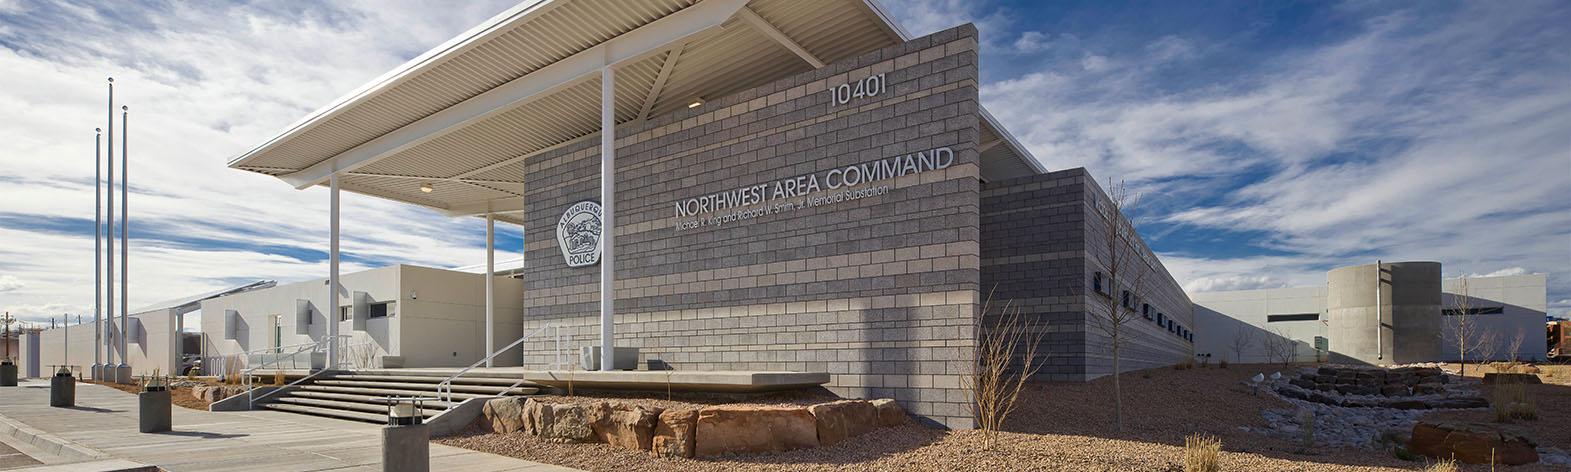 Albuquerque Police Station